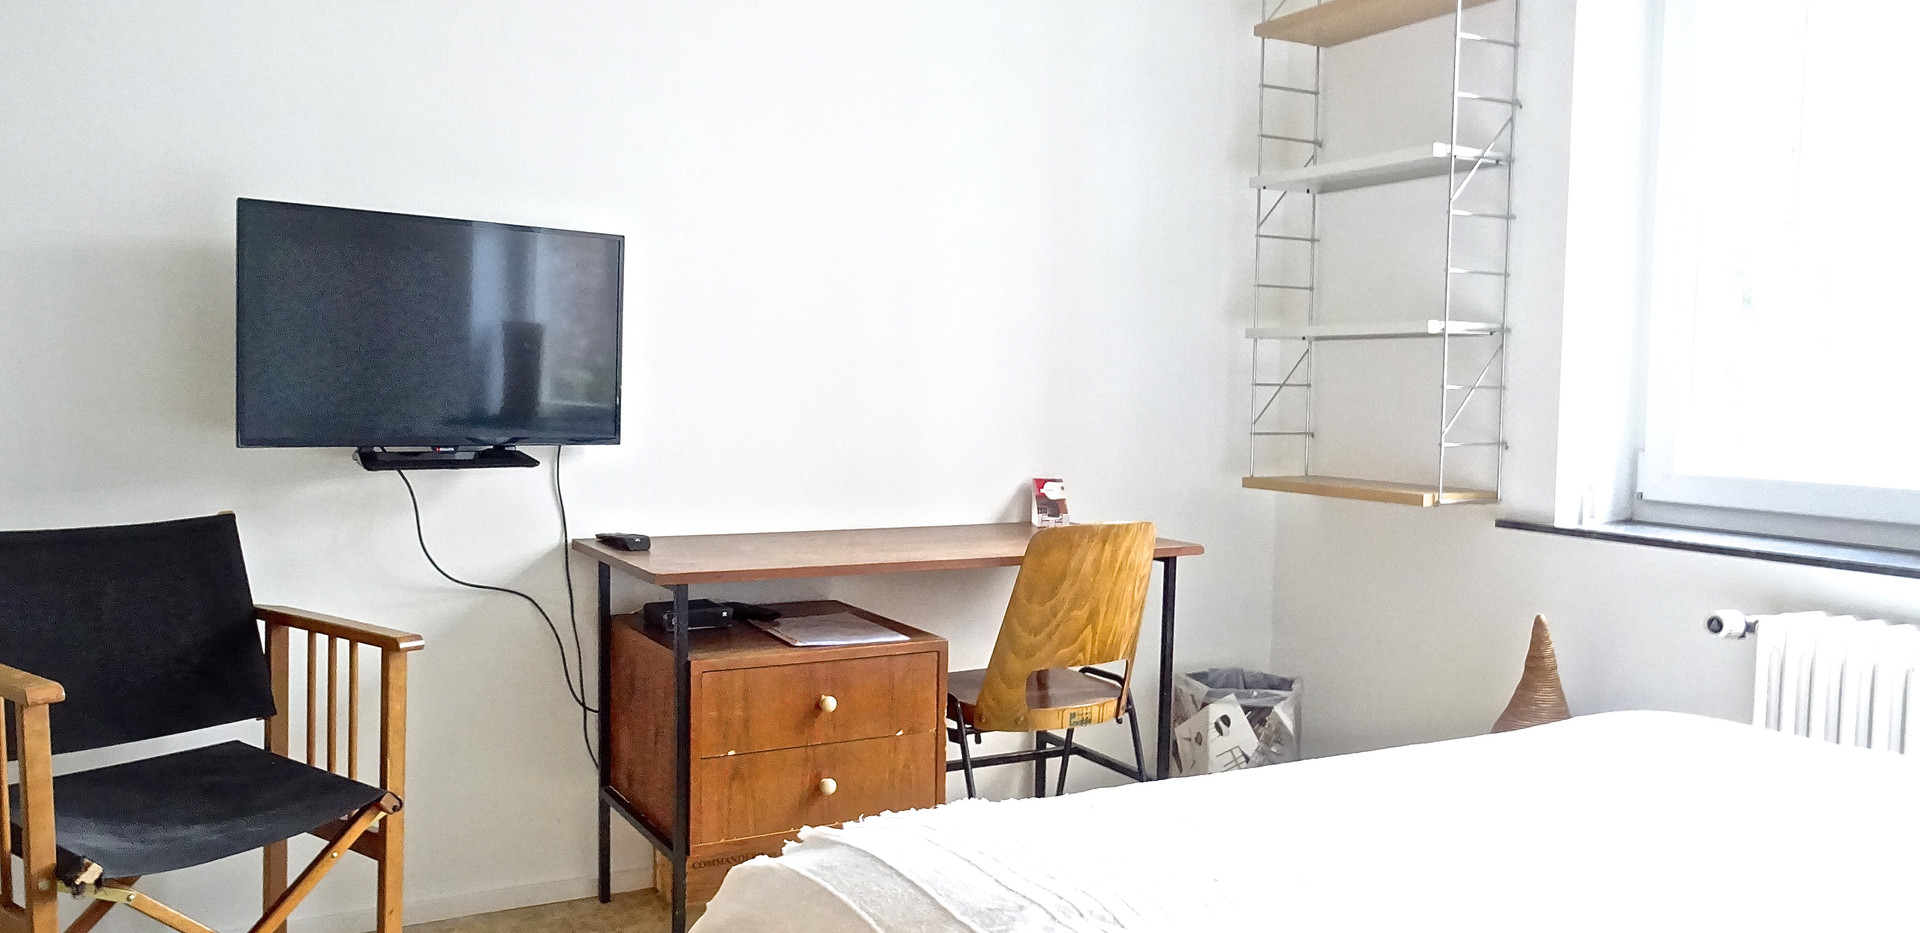 60's bureau table with vintage Baumann chair, Morrocan carpet, african basket & book shelves at White Design Brussels.